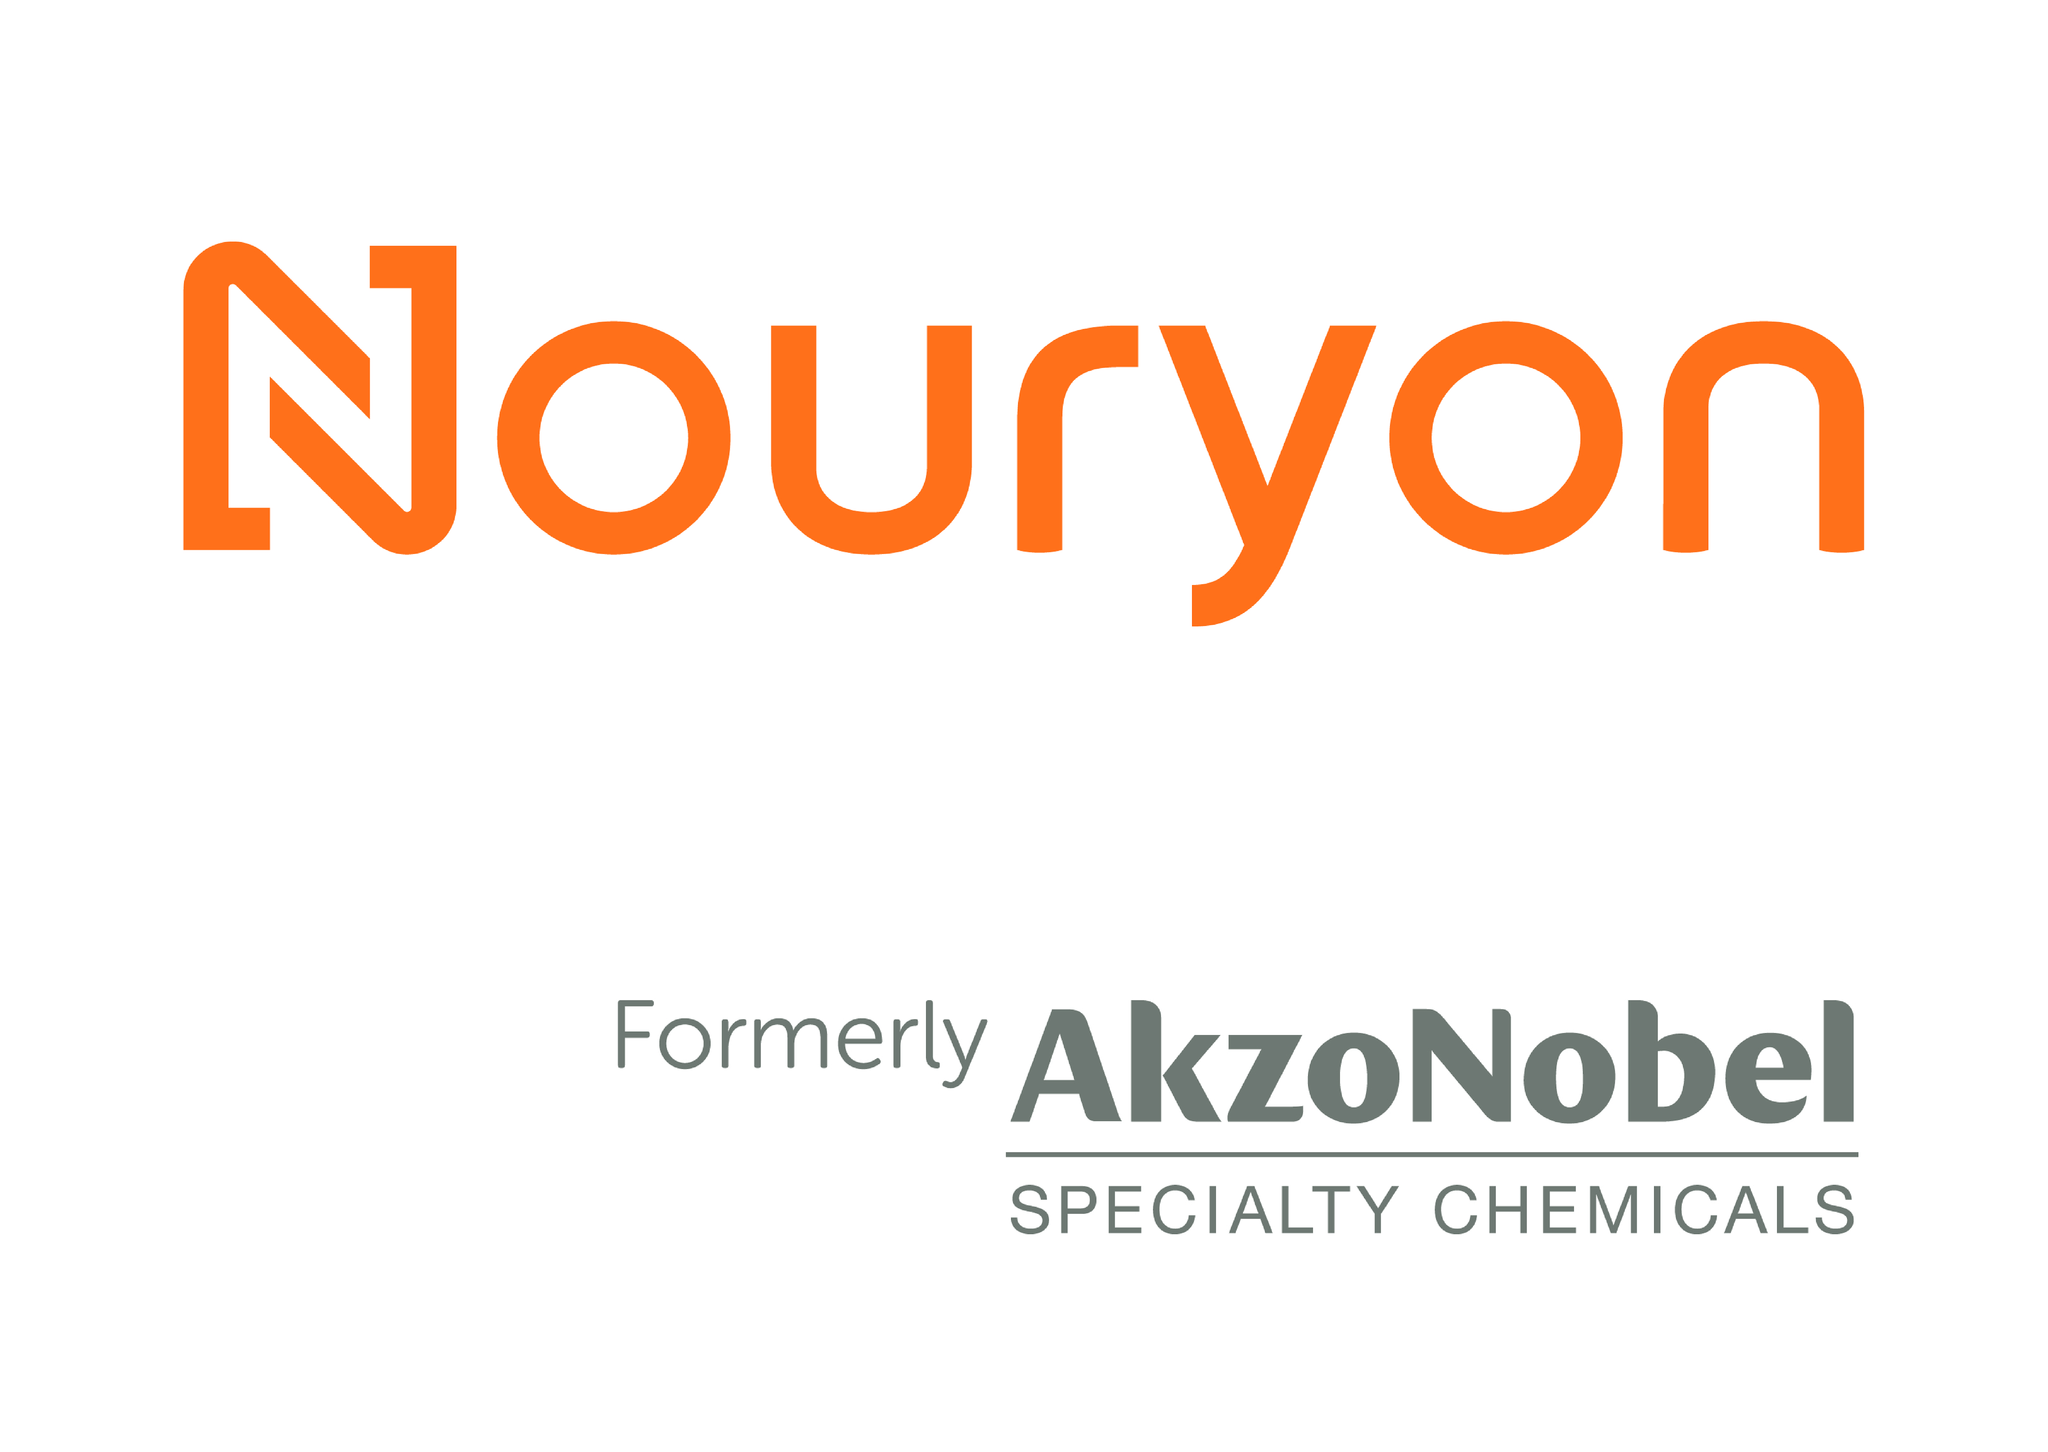 NOURYON  (AKZONOBEL SPECIALITY CHEMICALS)